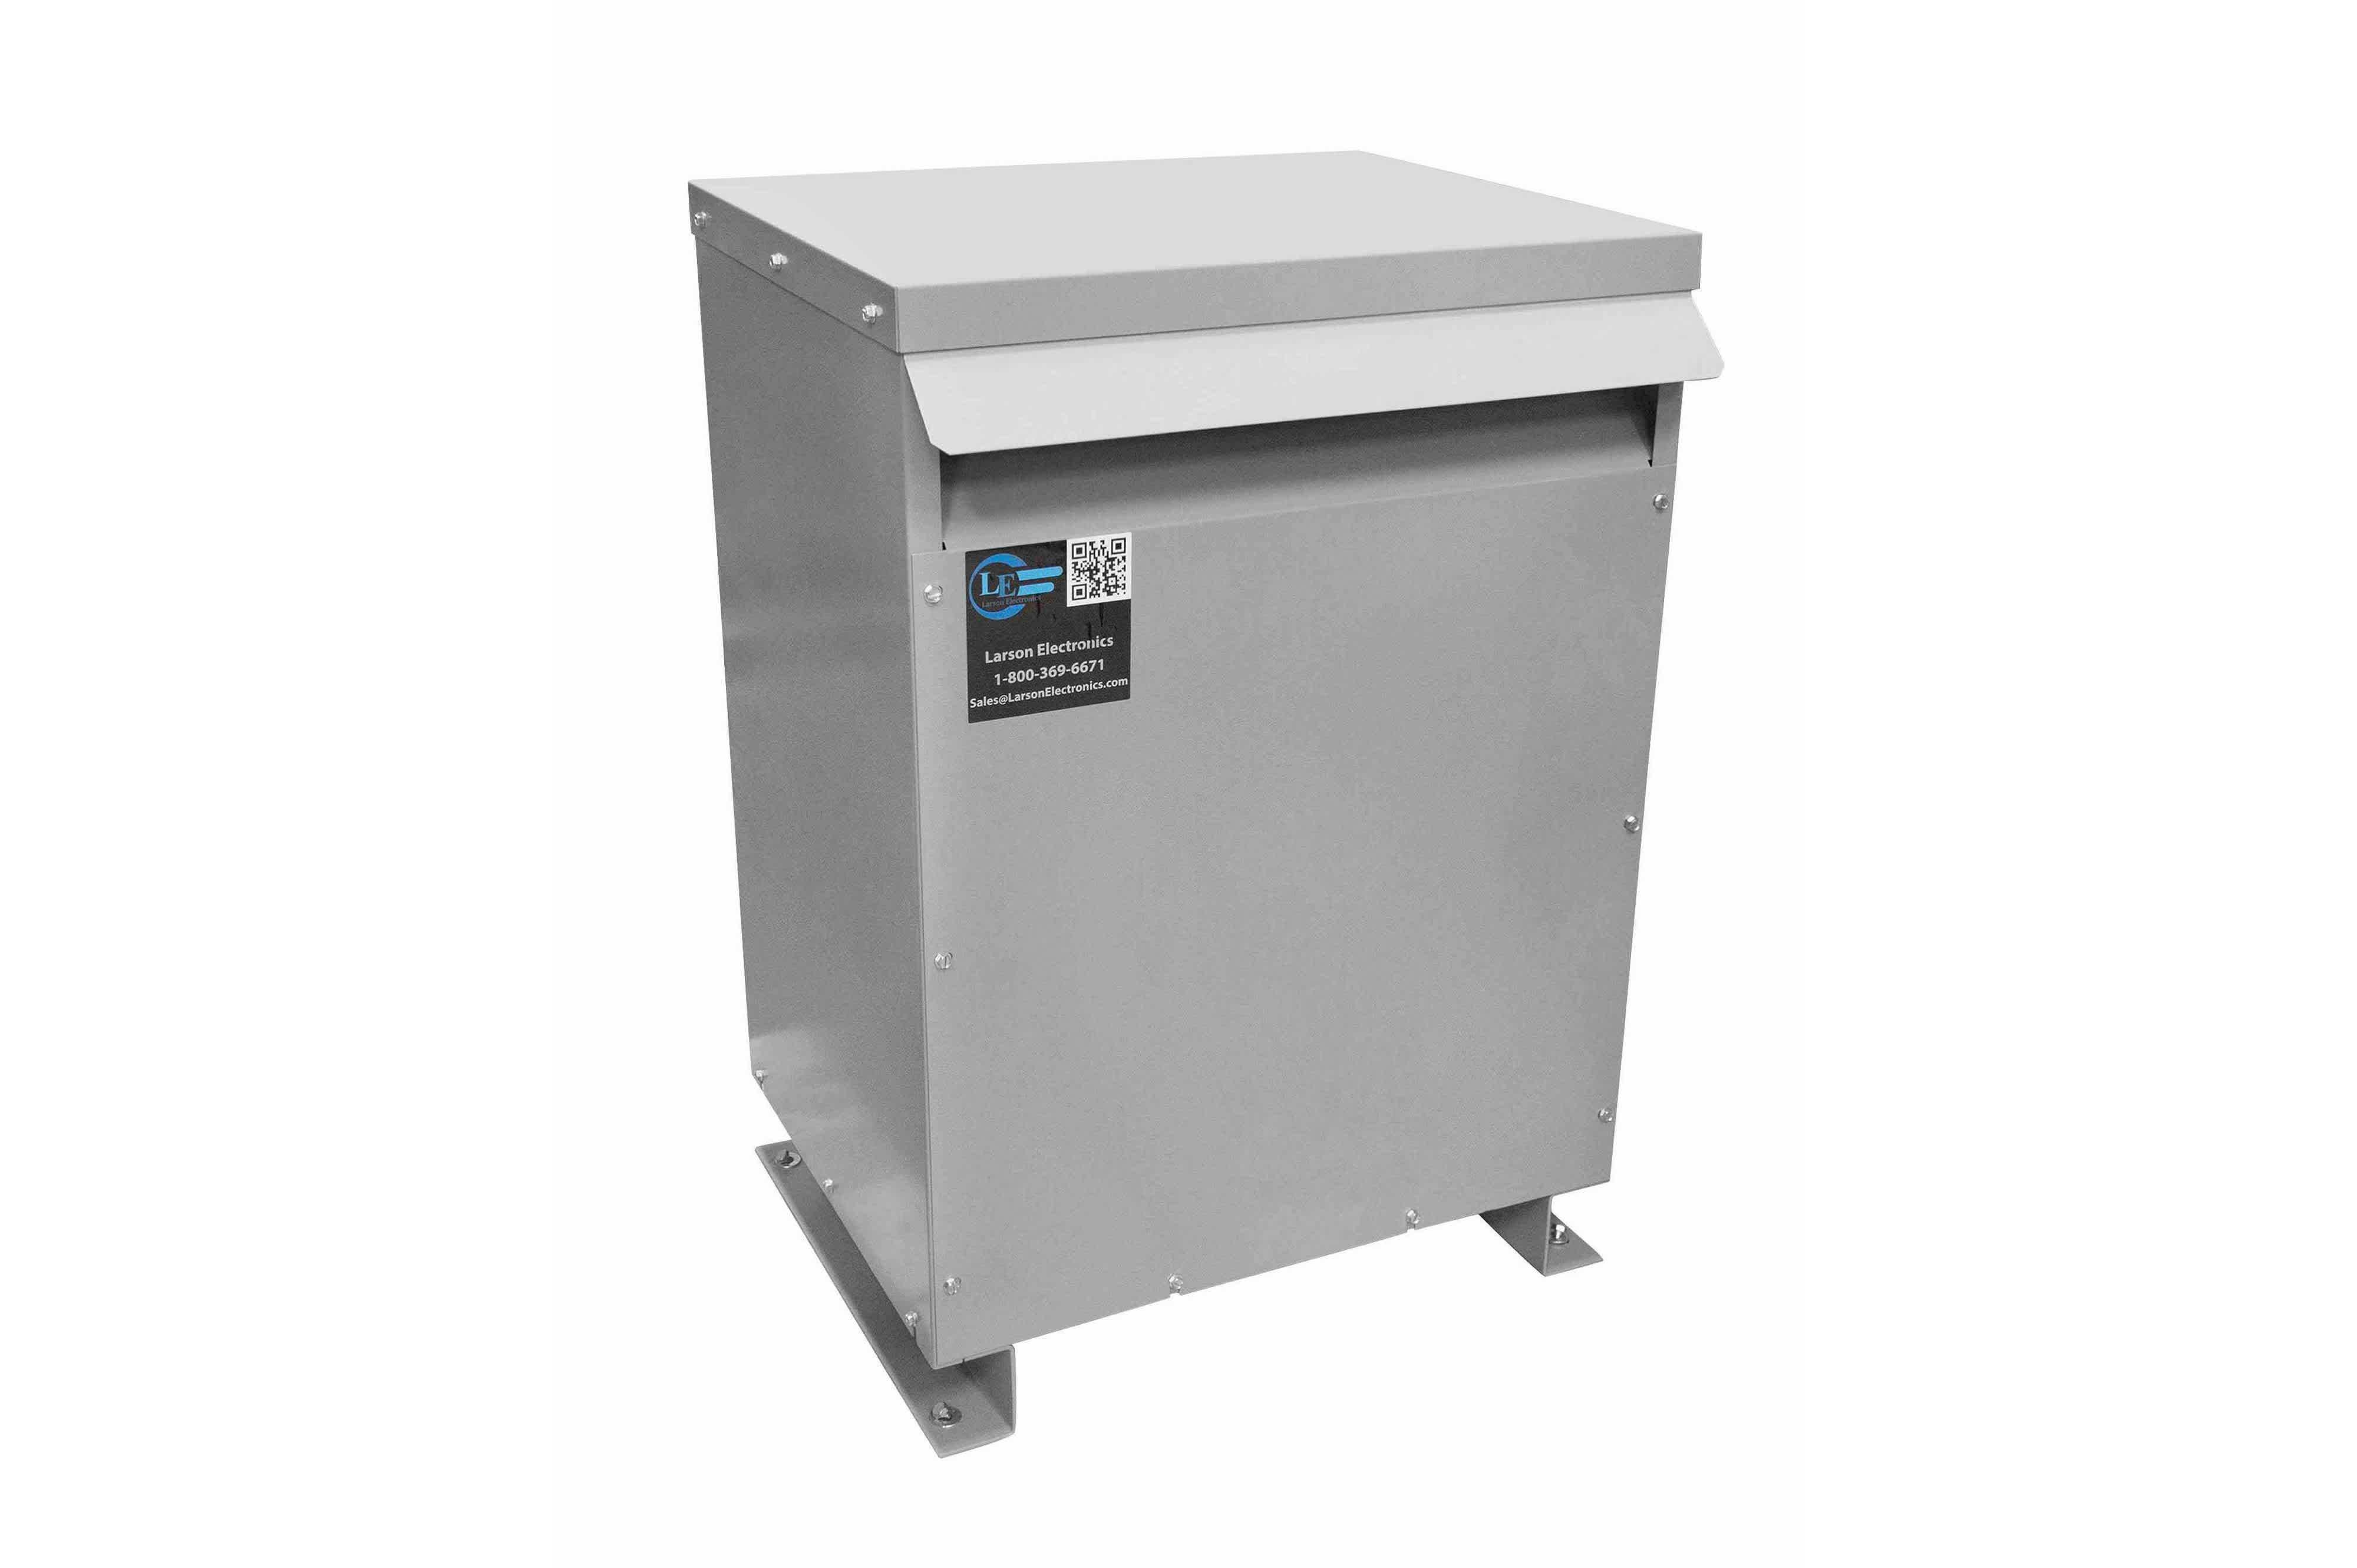 25 kVA 3PH Isolation Transformer, 380V Wye Primary, 600Y/347 Wye-N Secondary, N3R, Ventilated, 60 Hz